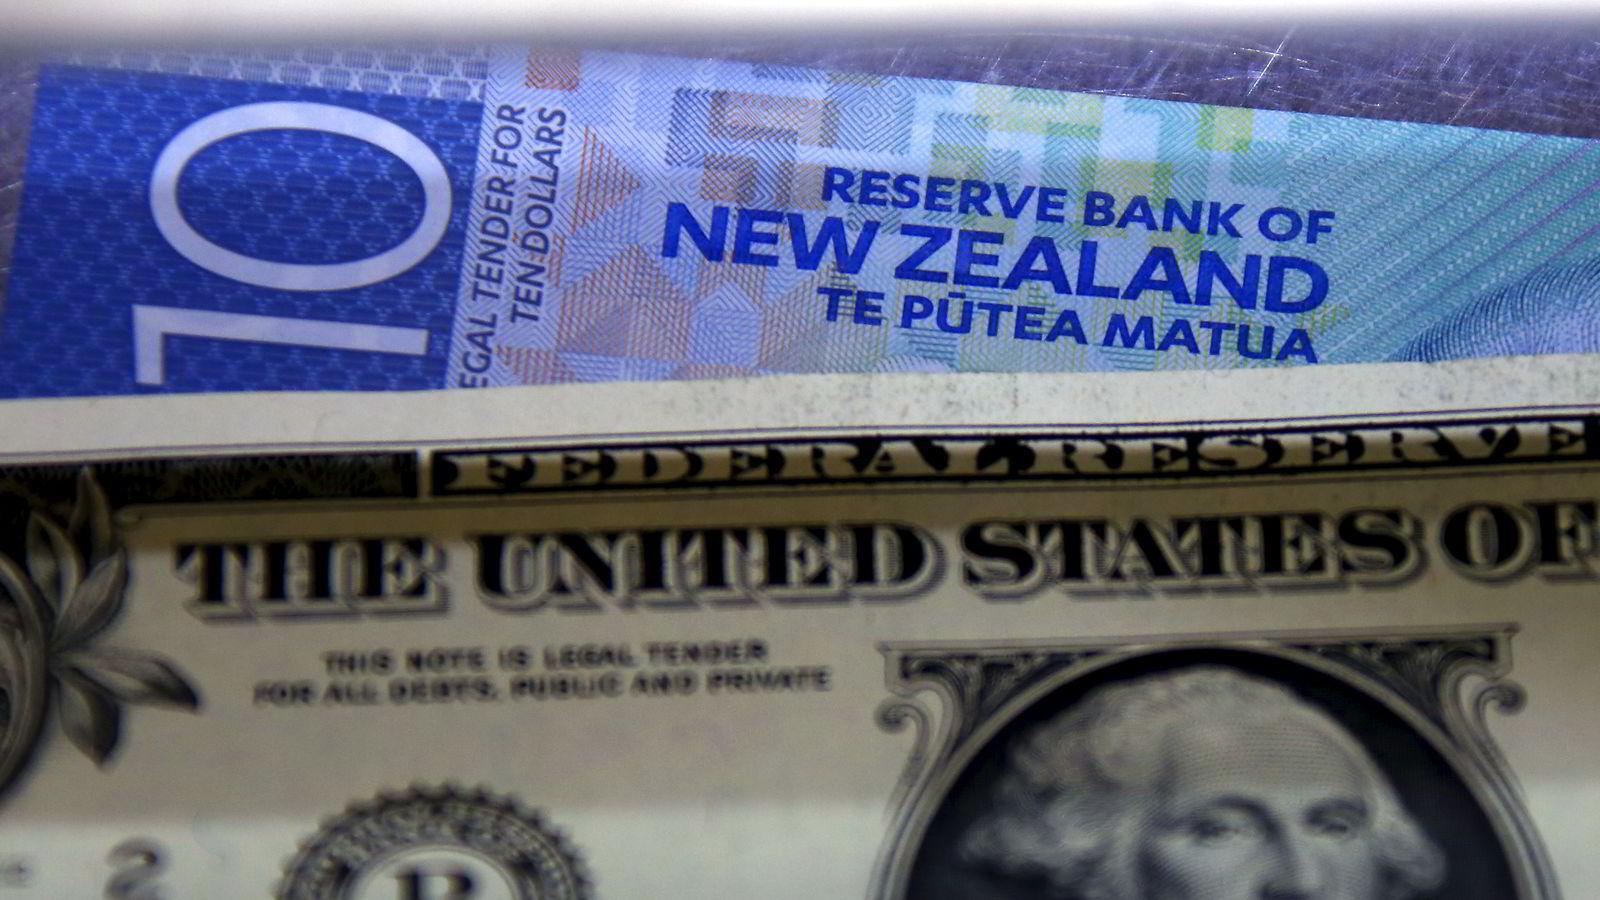 New Zealands sentralbank kutter overraskende renten, noe som sendte landets egen valuta nedover samennlignet med den amerikanske dollaren. Foto: David Gray/Reuters/NTB Scanpix.